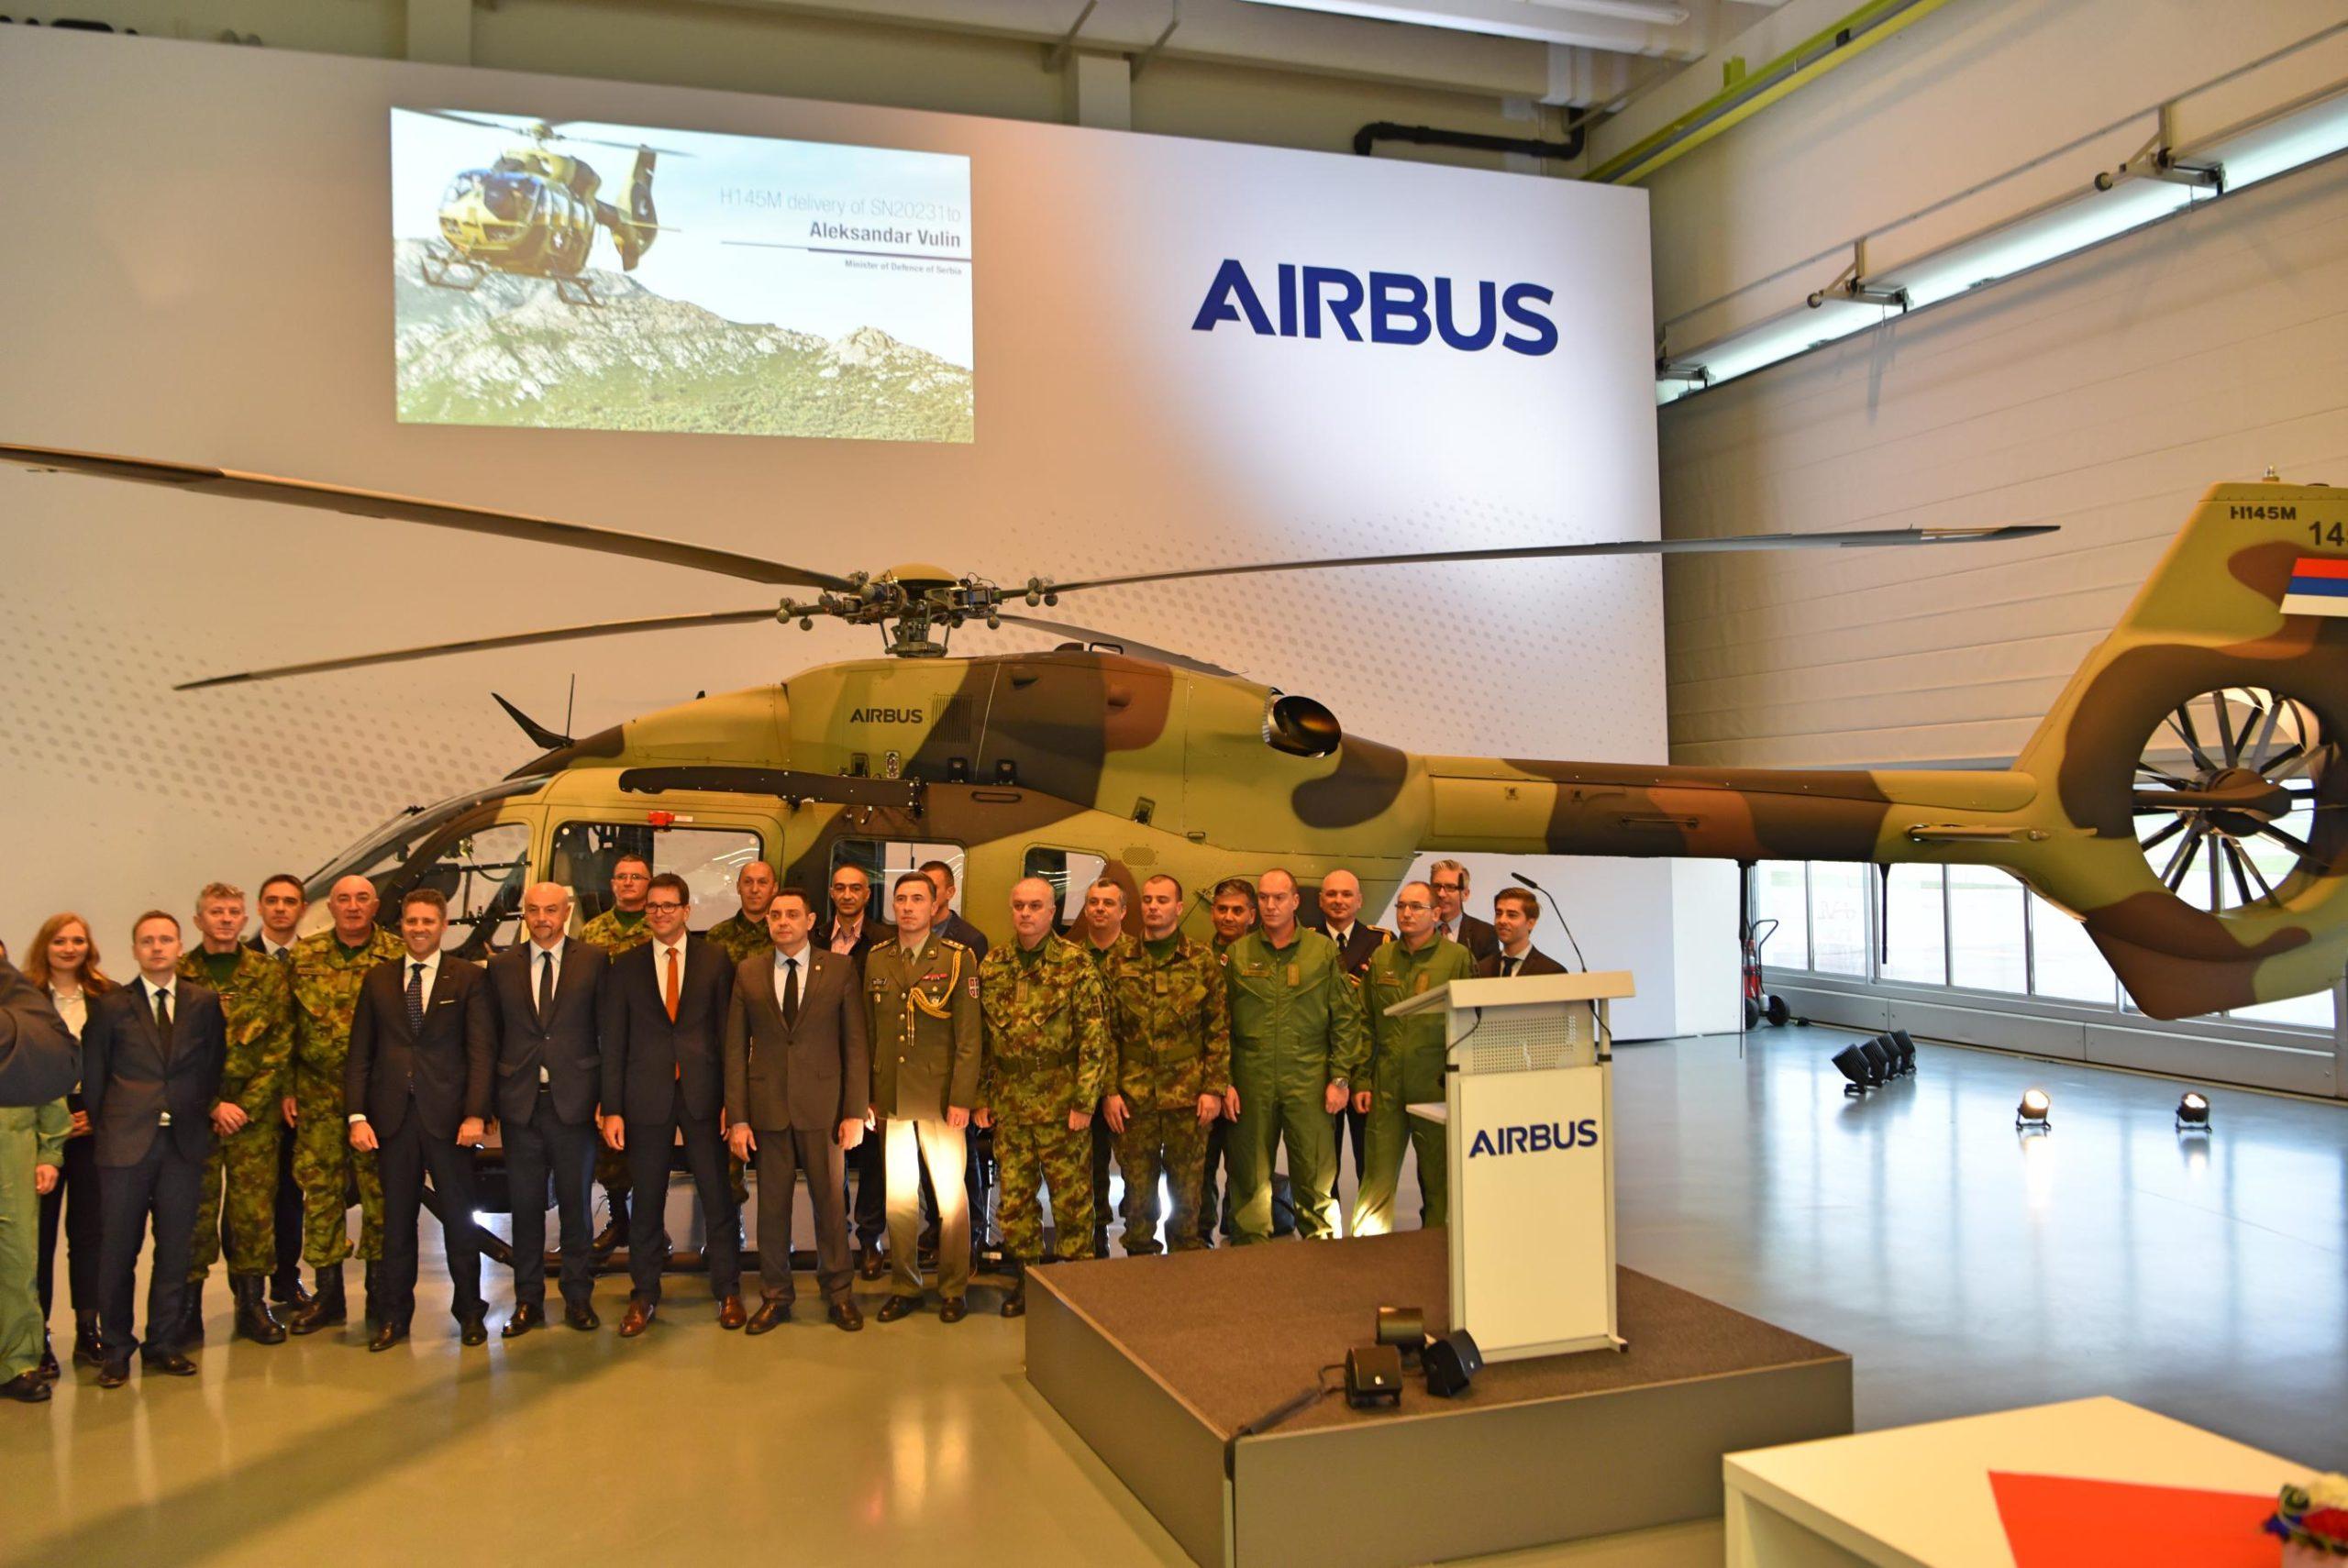 Сербия и Airbus Helicopters развивают партнерство